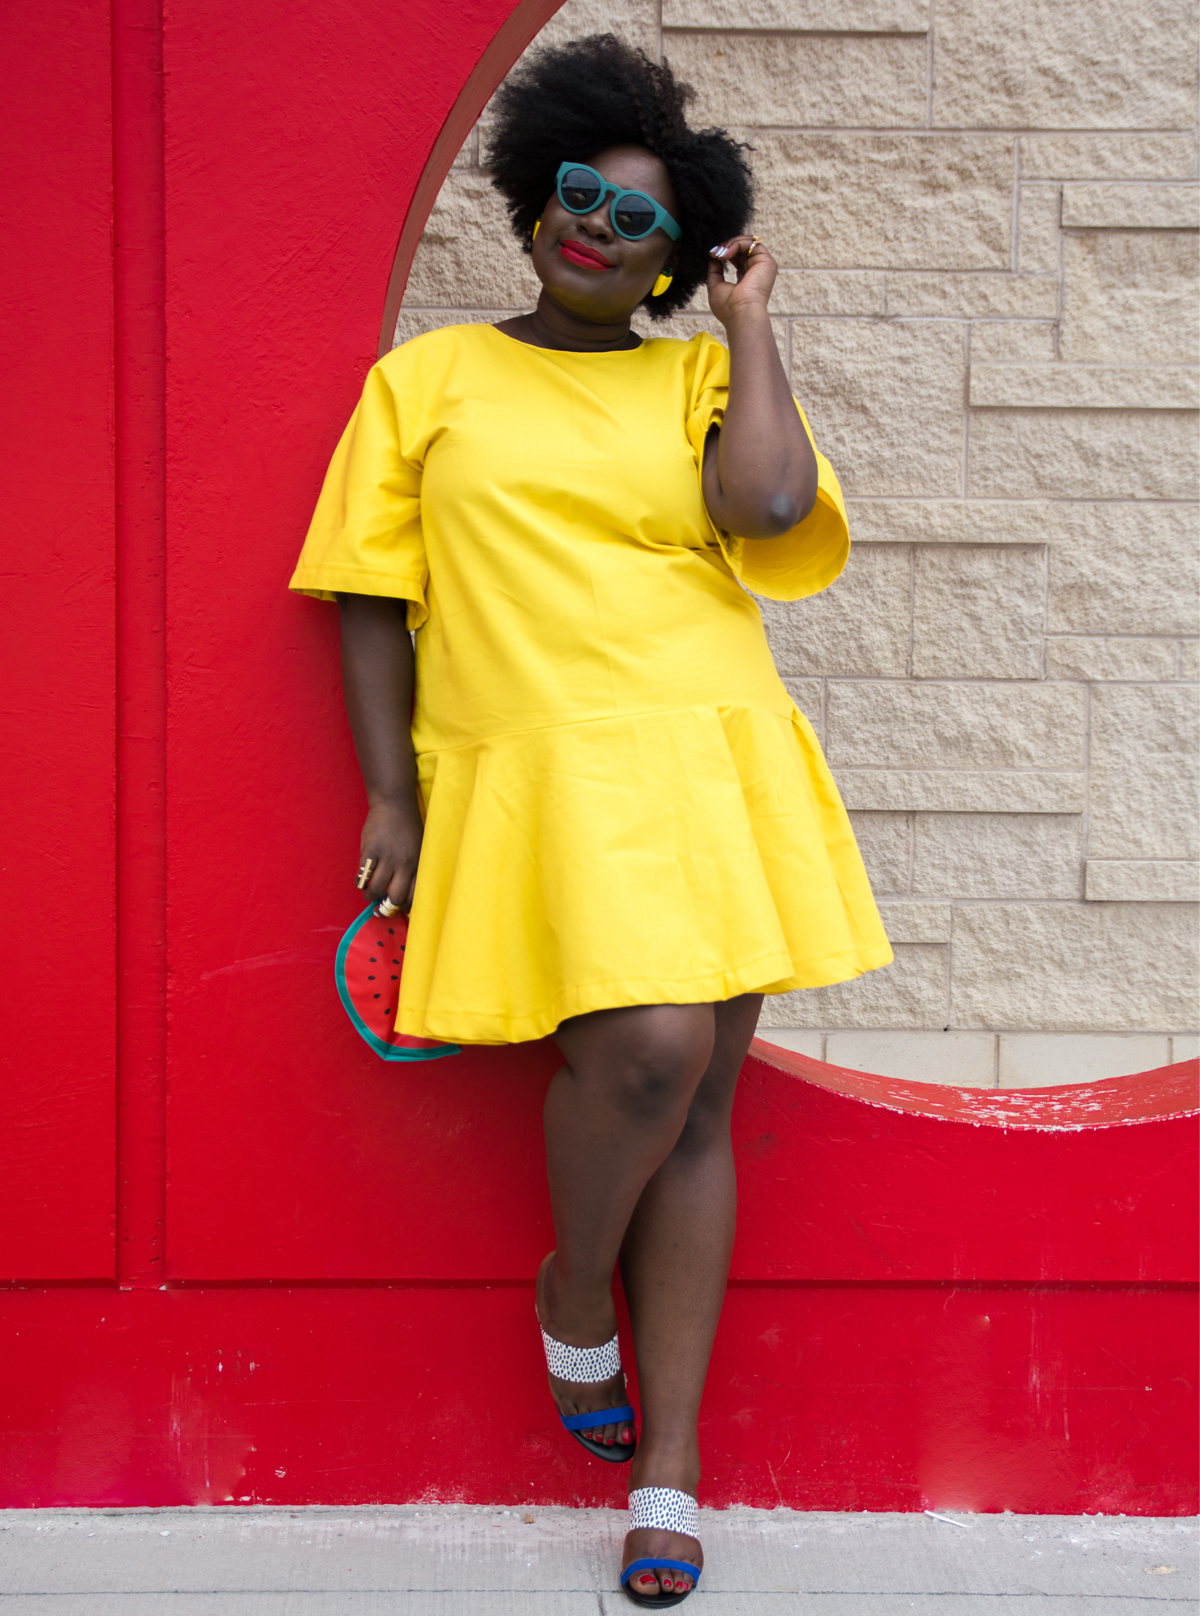 bush magazine mo handahu plus size full skirt plus size canadian blogger plus size summer style plus size mixing prints solange yellow dress 05